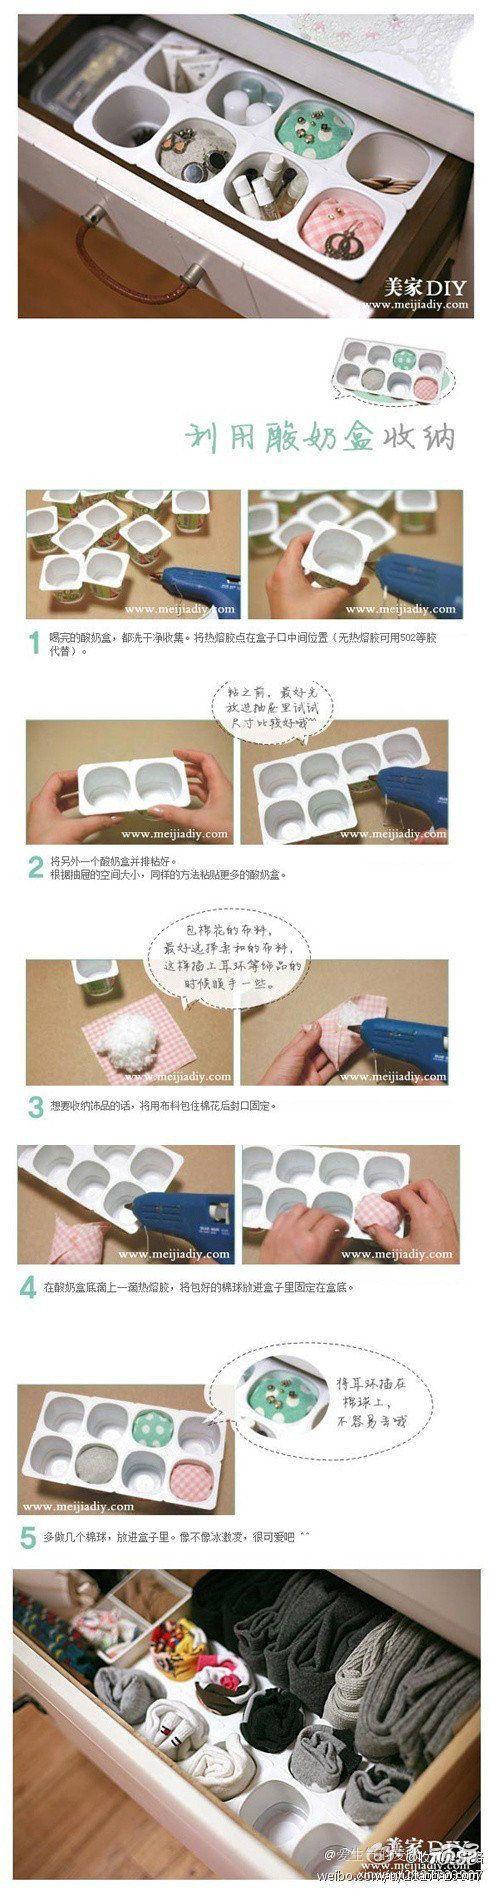 DIY tasse de yogourt Organisateur bricolage Projets / UsefulDIY.com sur imgfave